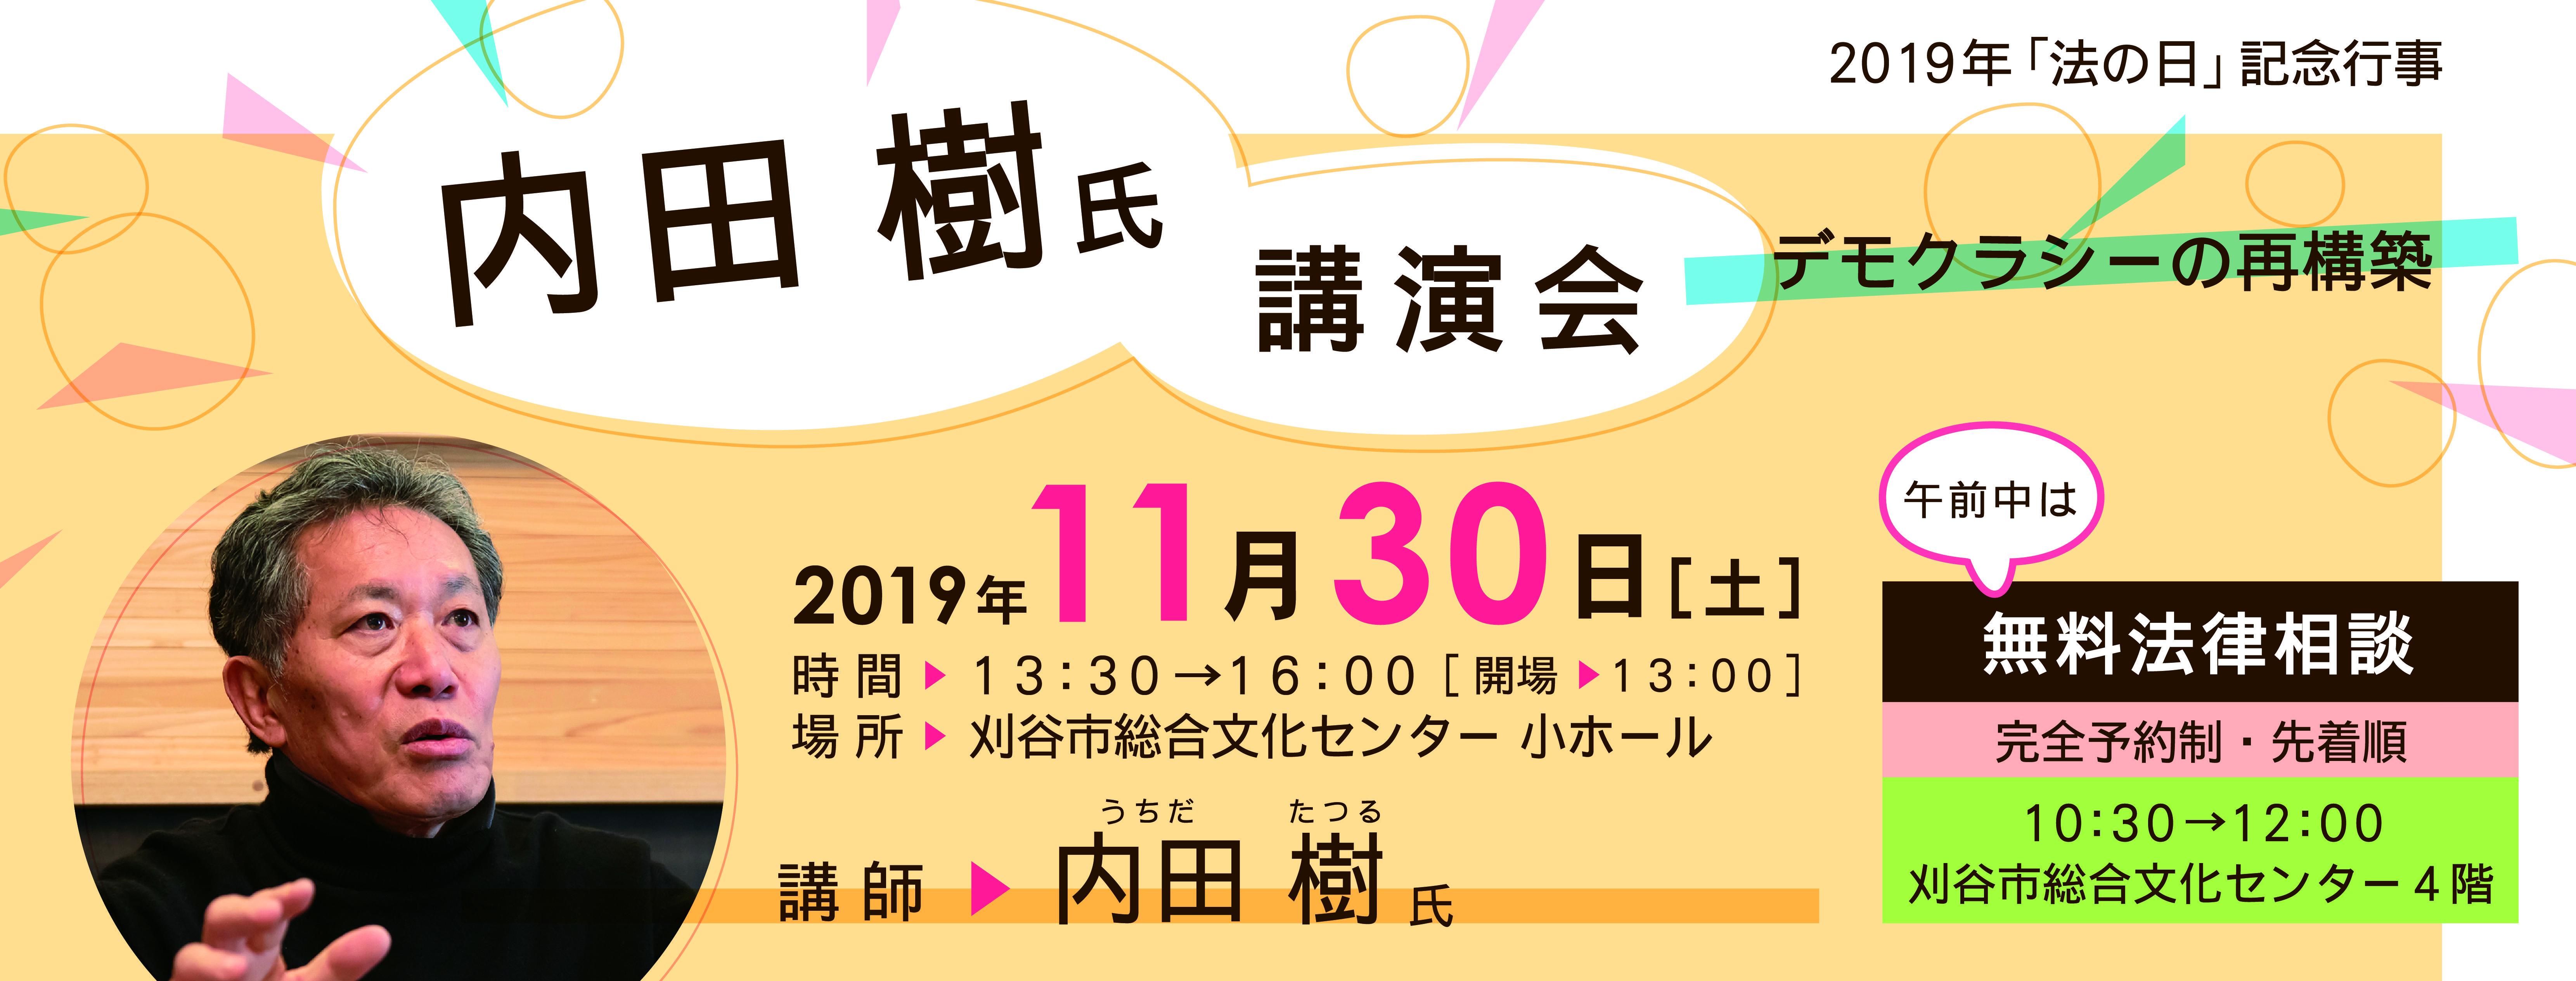 19hounohi-carousel.jpg